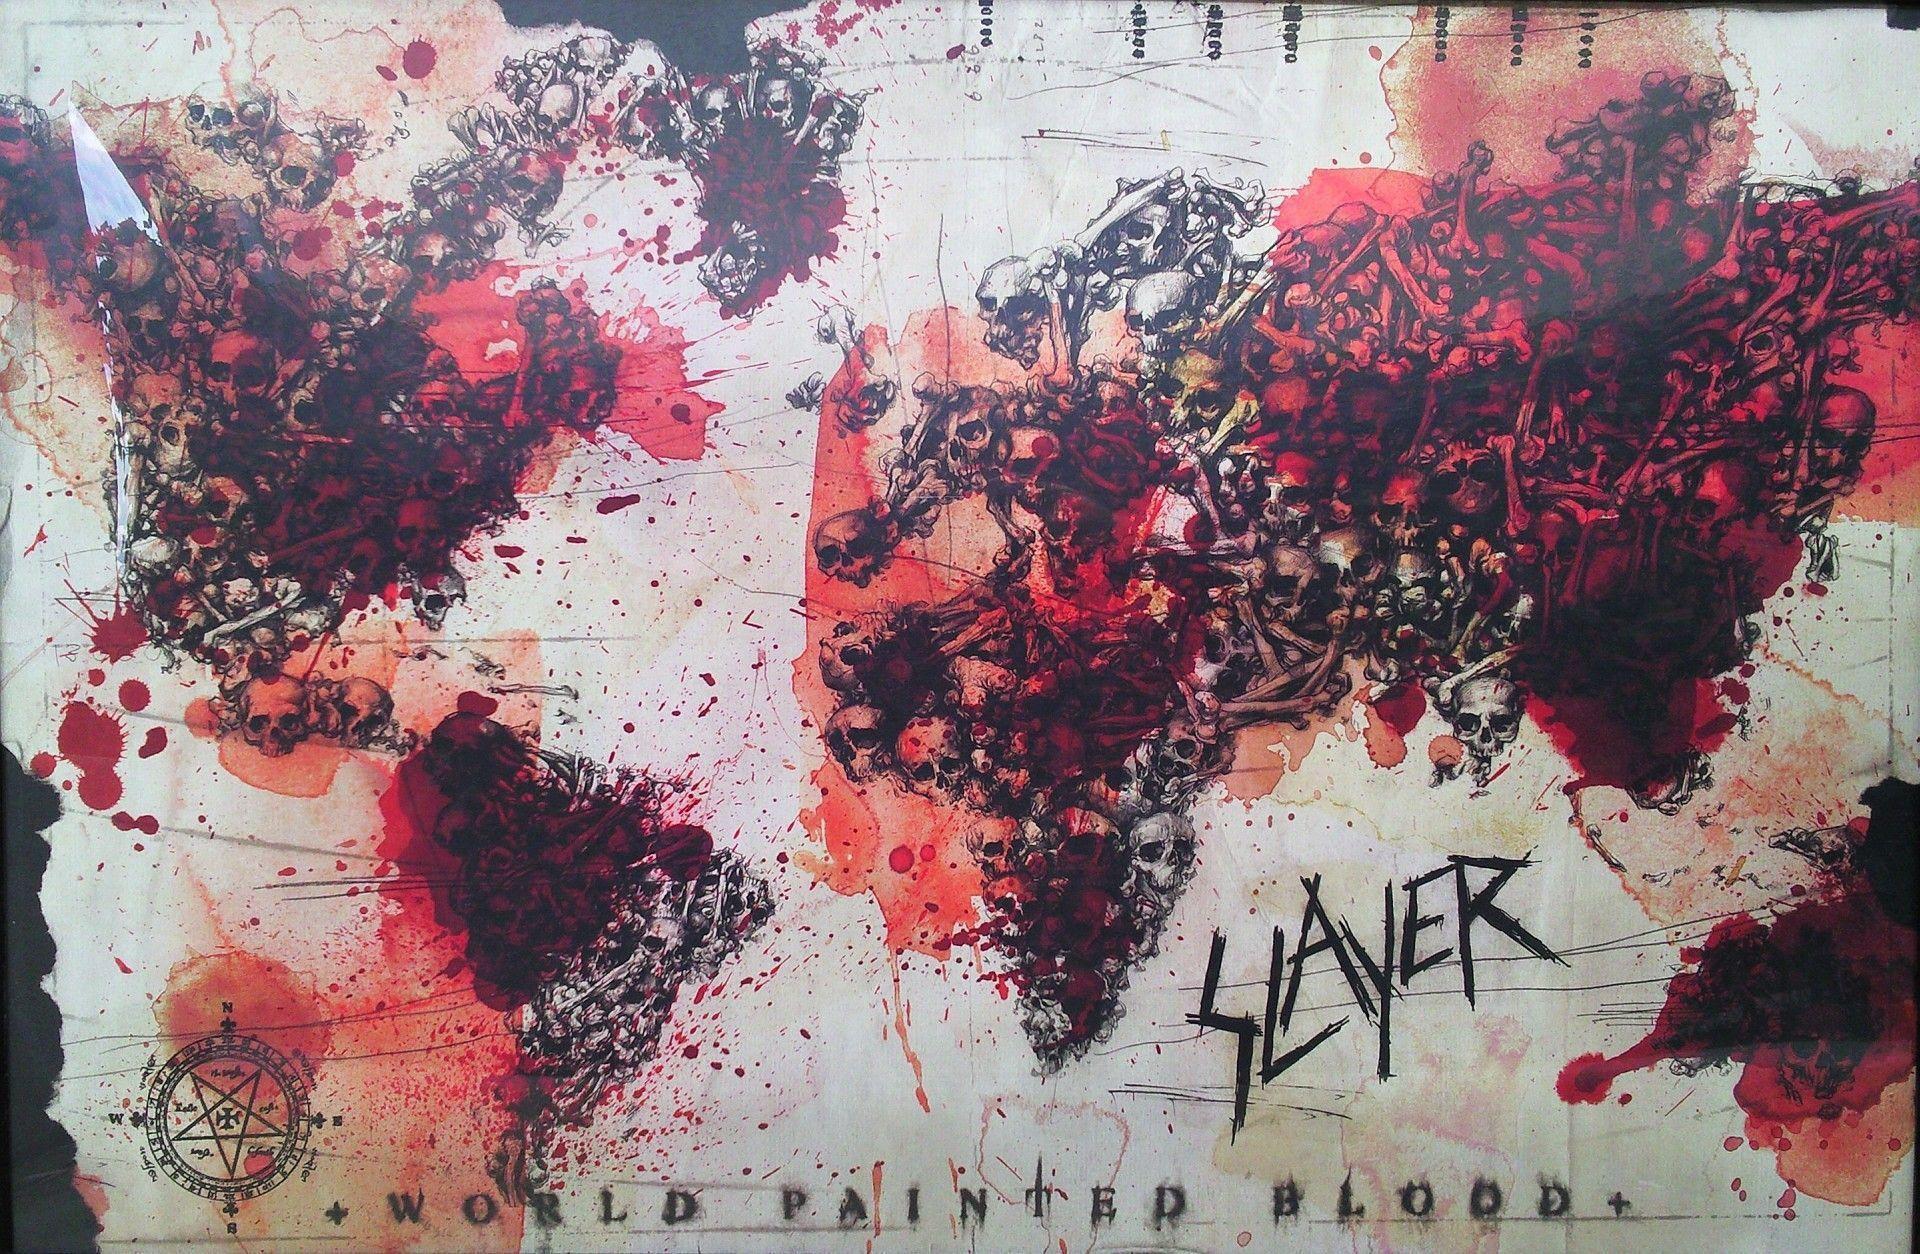 Slayer Wallpapers - Wallpaper Cave